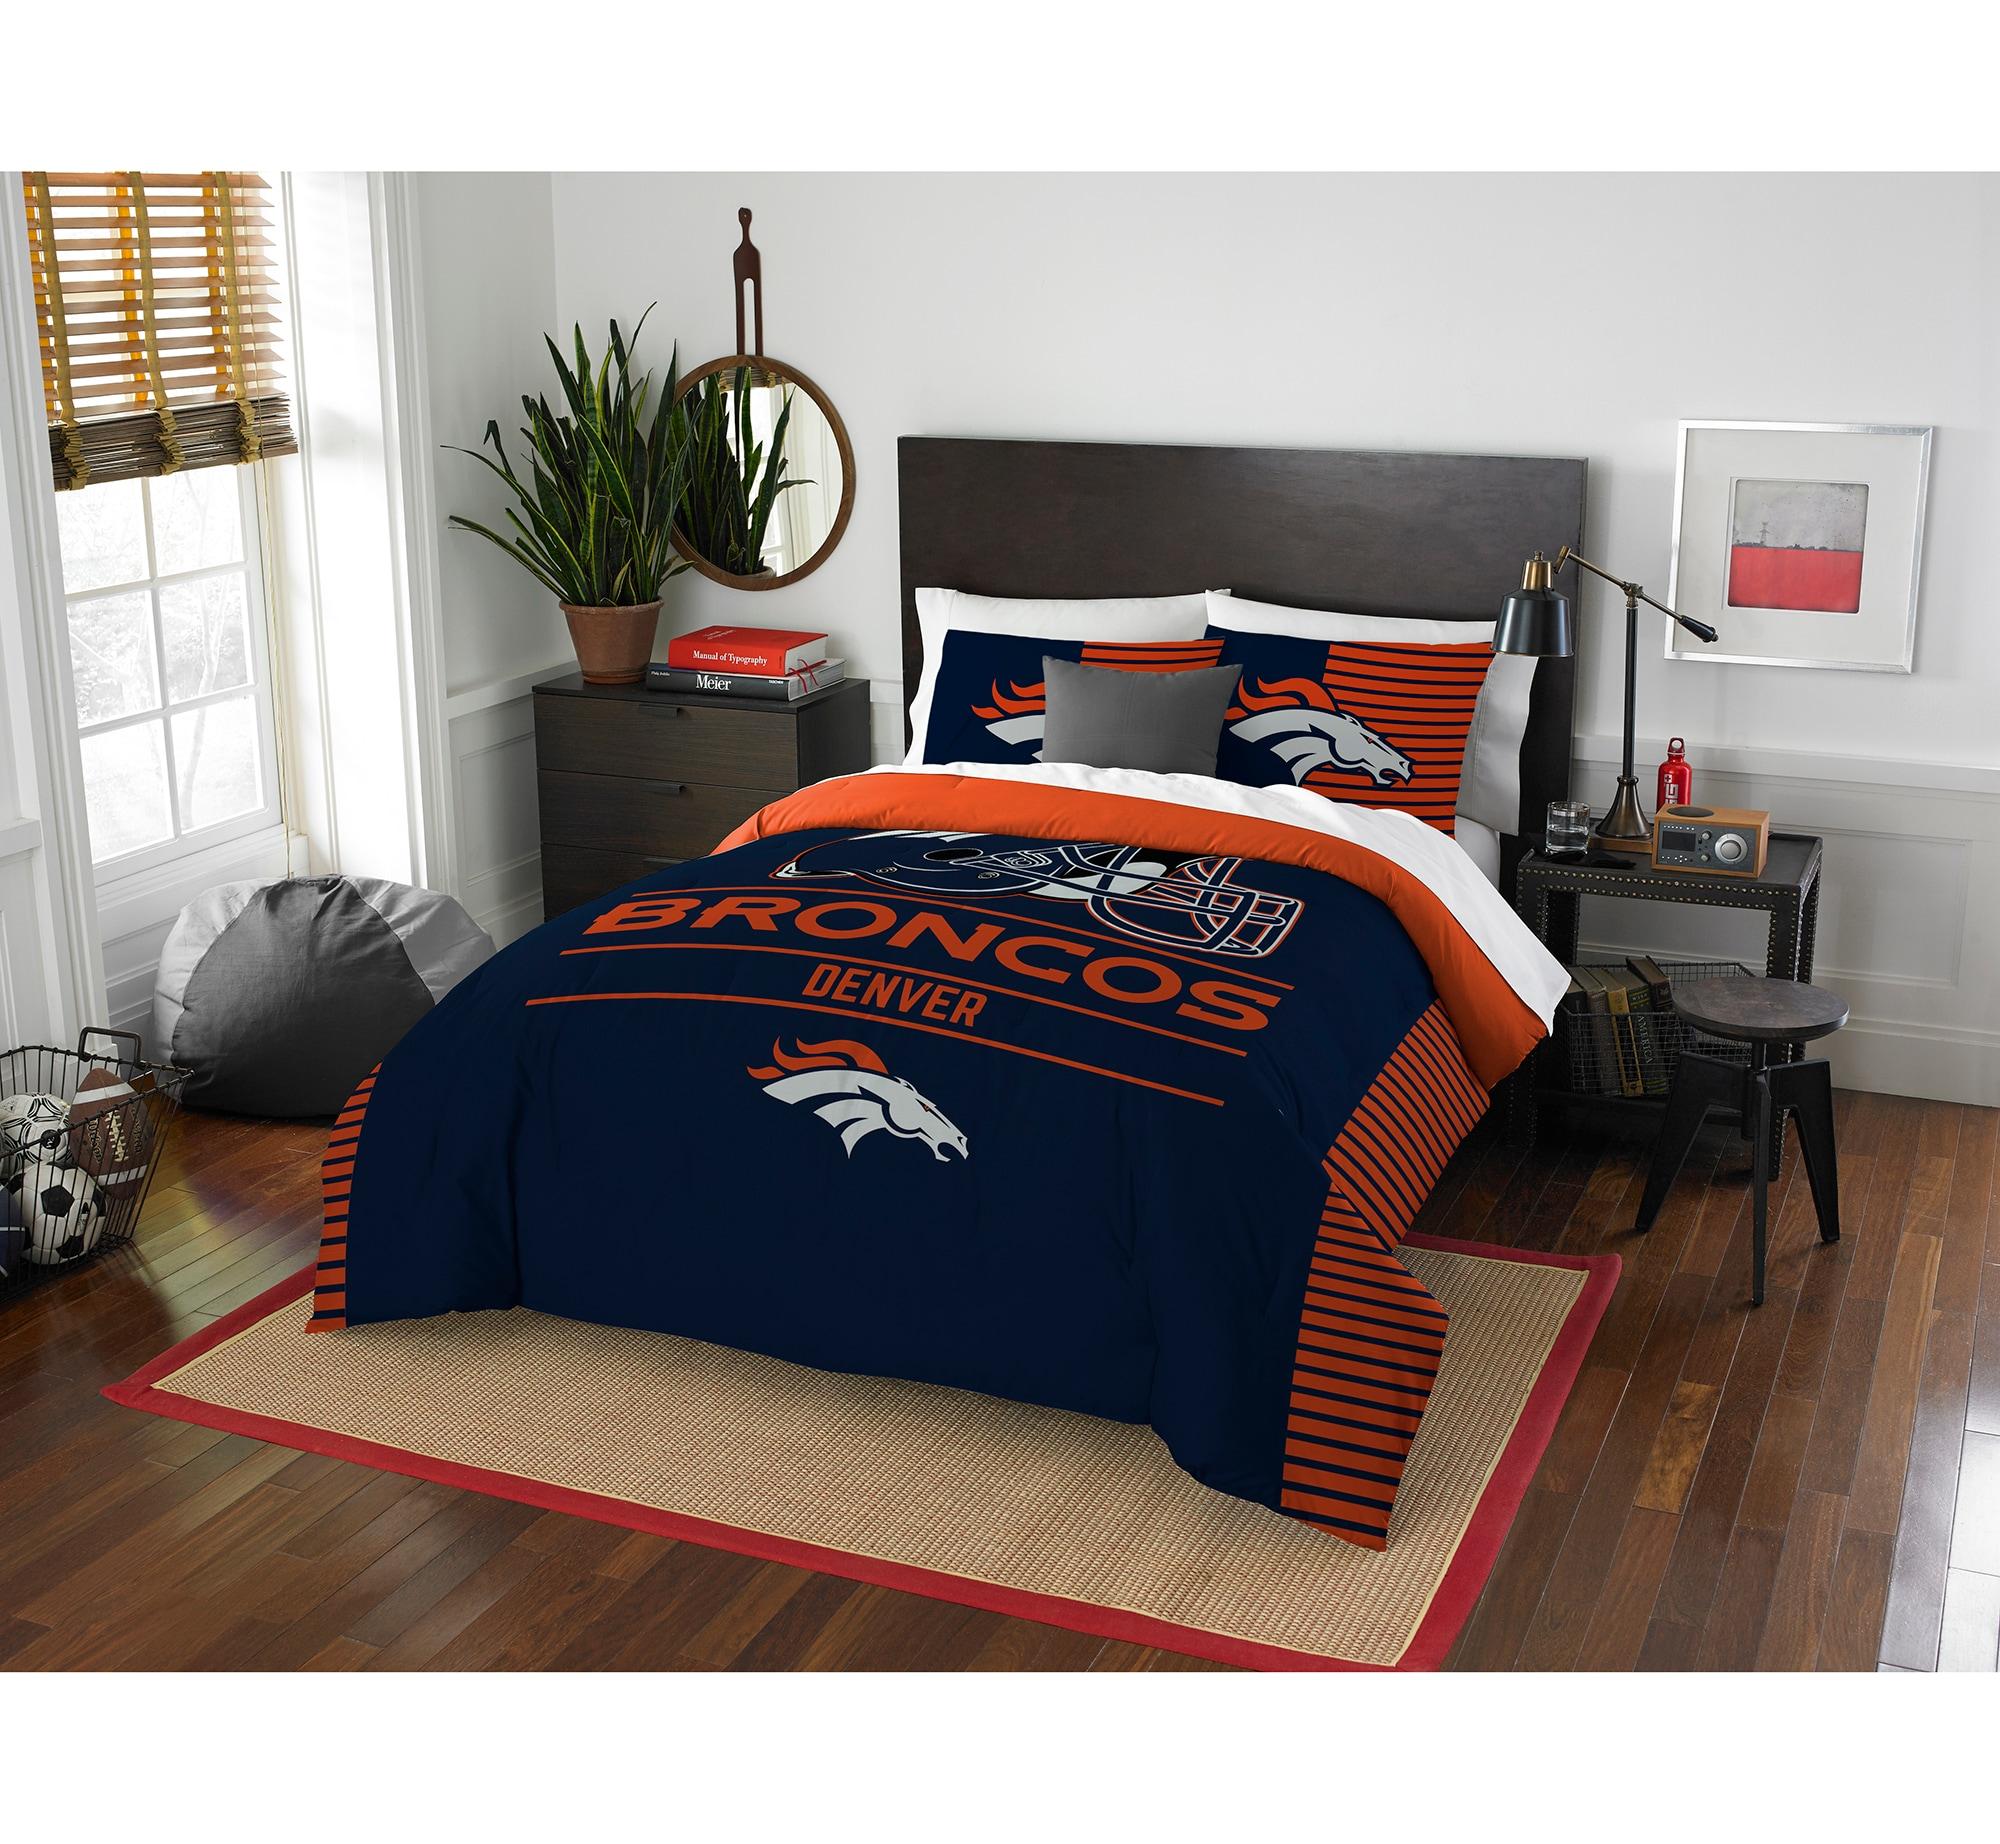 Denver Broncos The Northwest Company NFL Draft Full/Queen Comforter Set